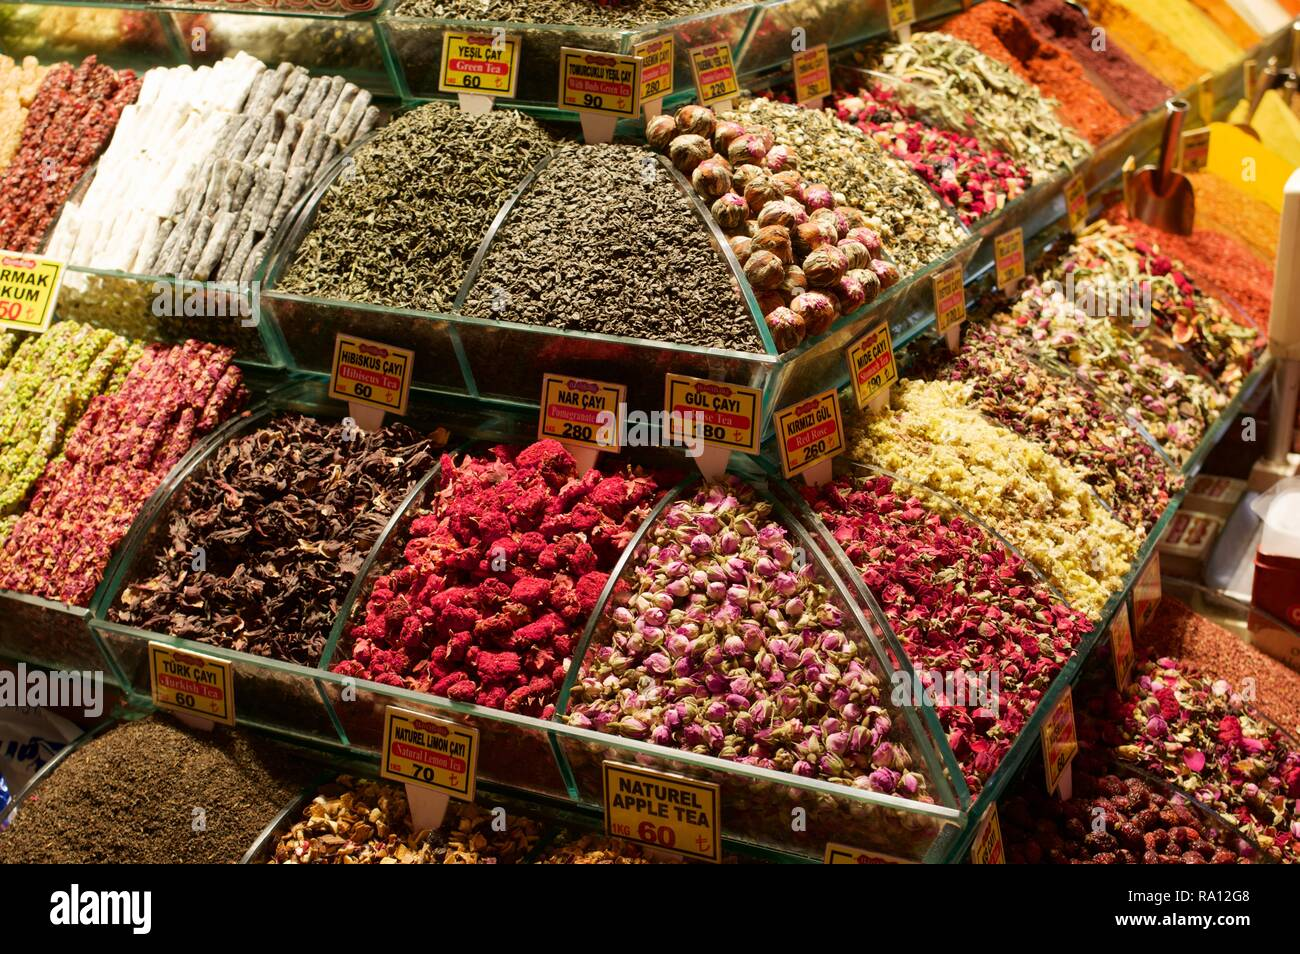 Herbal teas on sale at the Egyptian bazaar, Istanbul - Stock Image